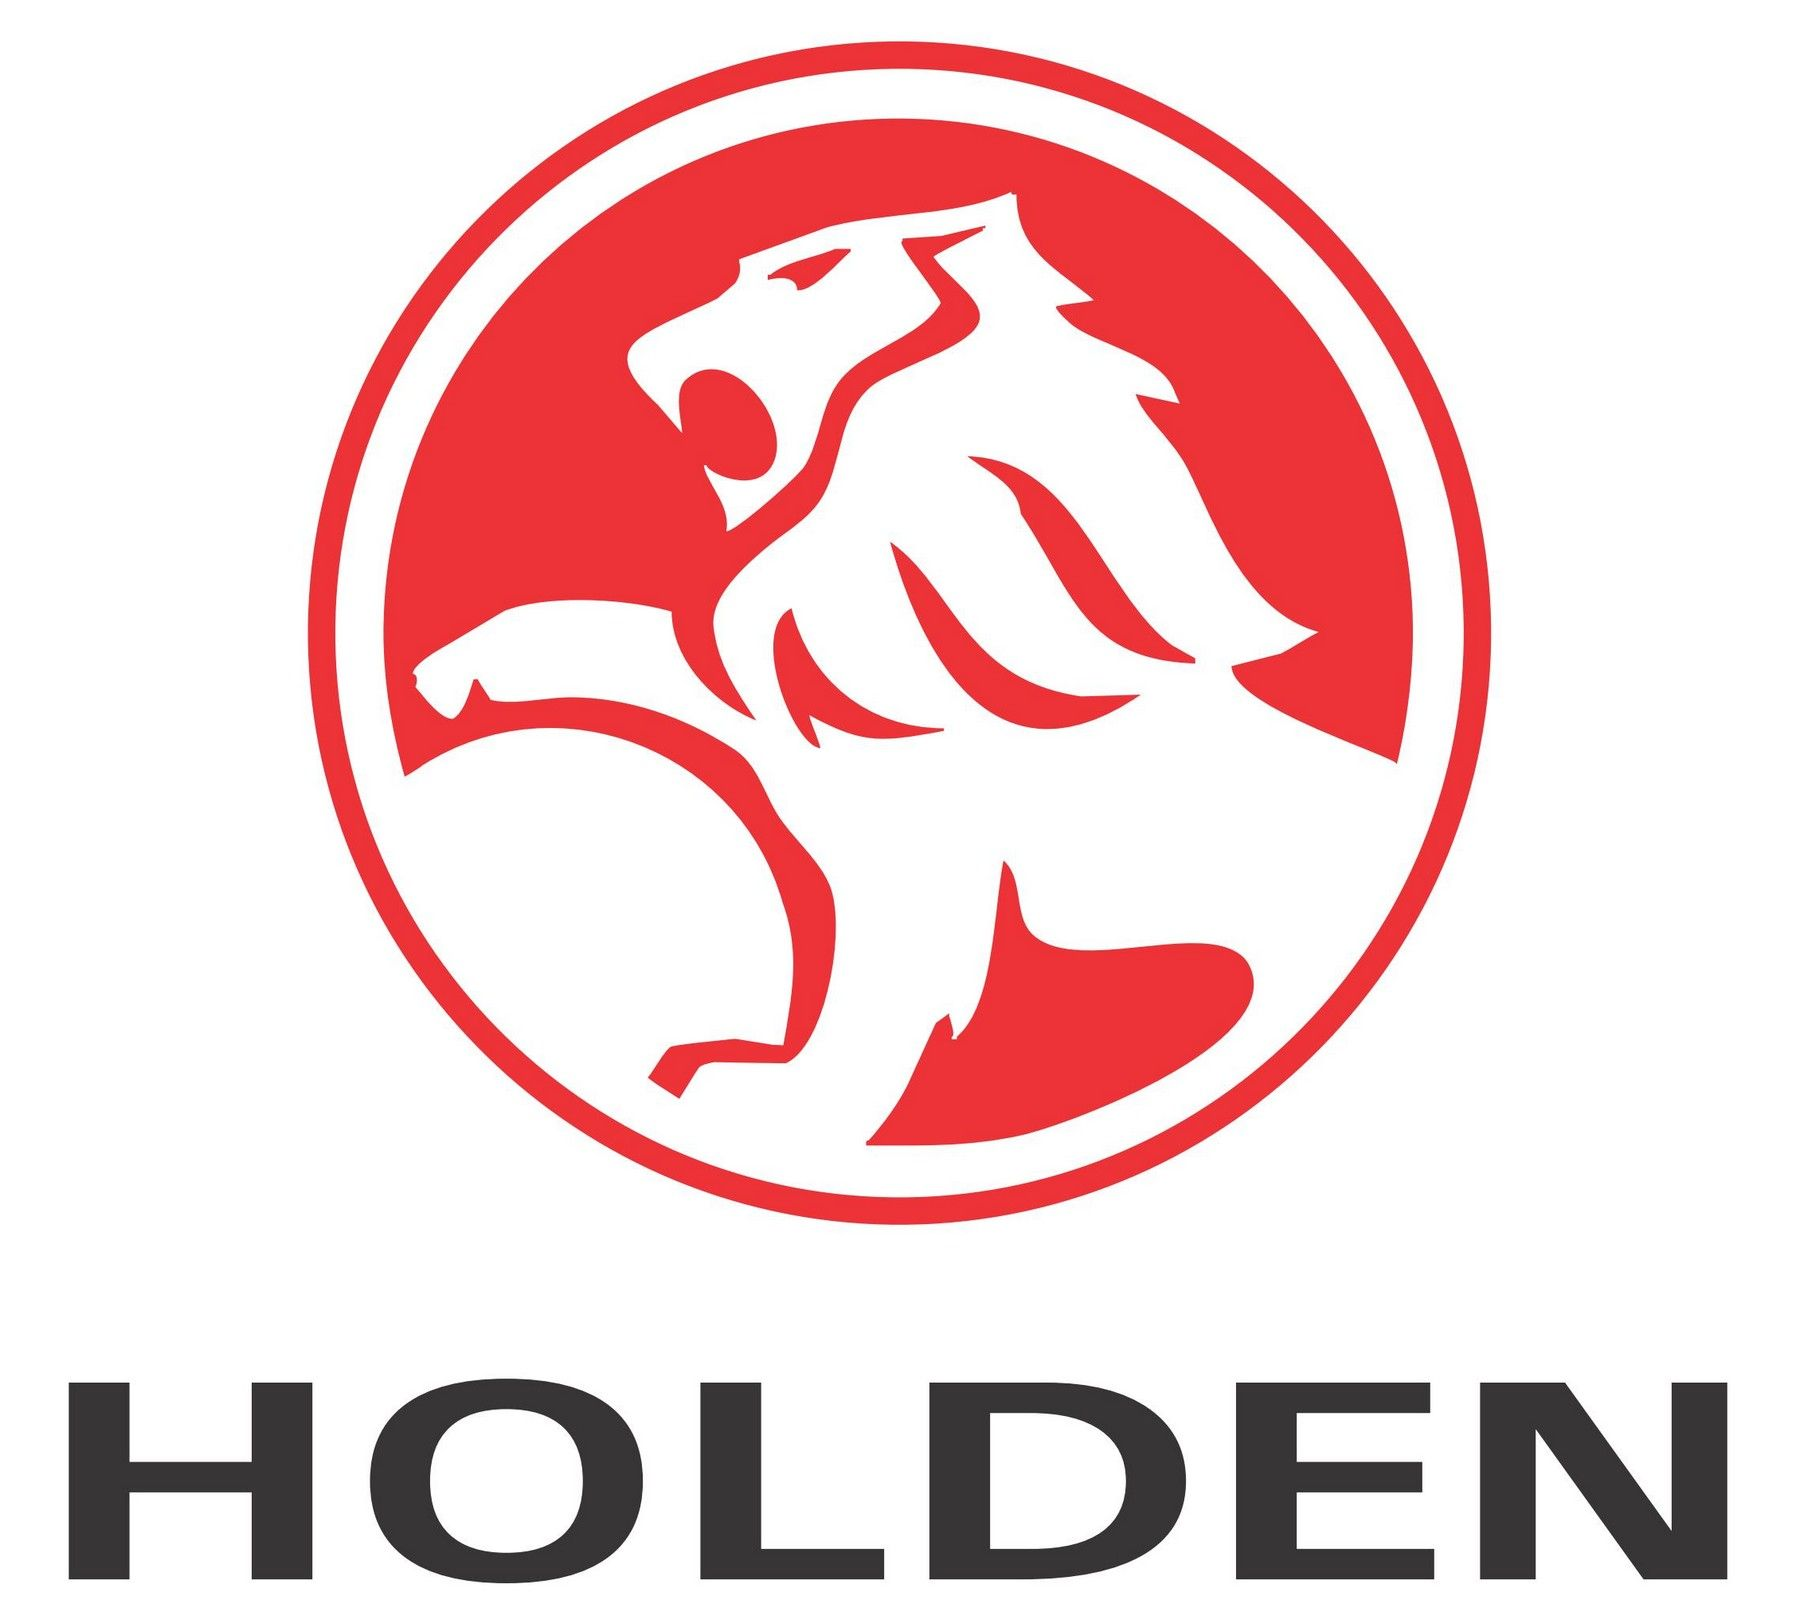 Holden logo eps pdf car and motorcycle logos pinterest illuminati sun symbolism auto logos sun on cross part 3 buycottarizona